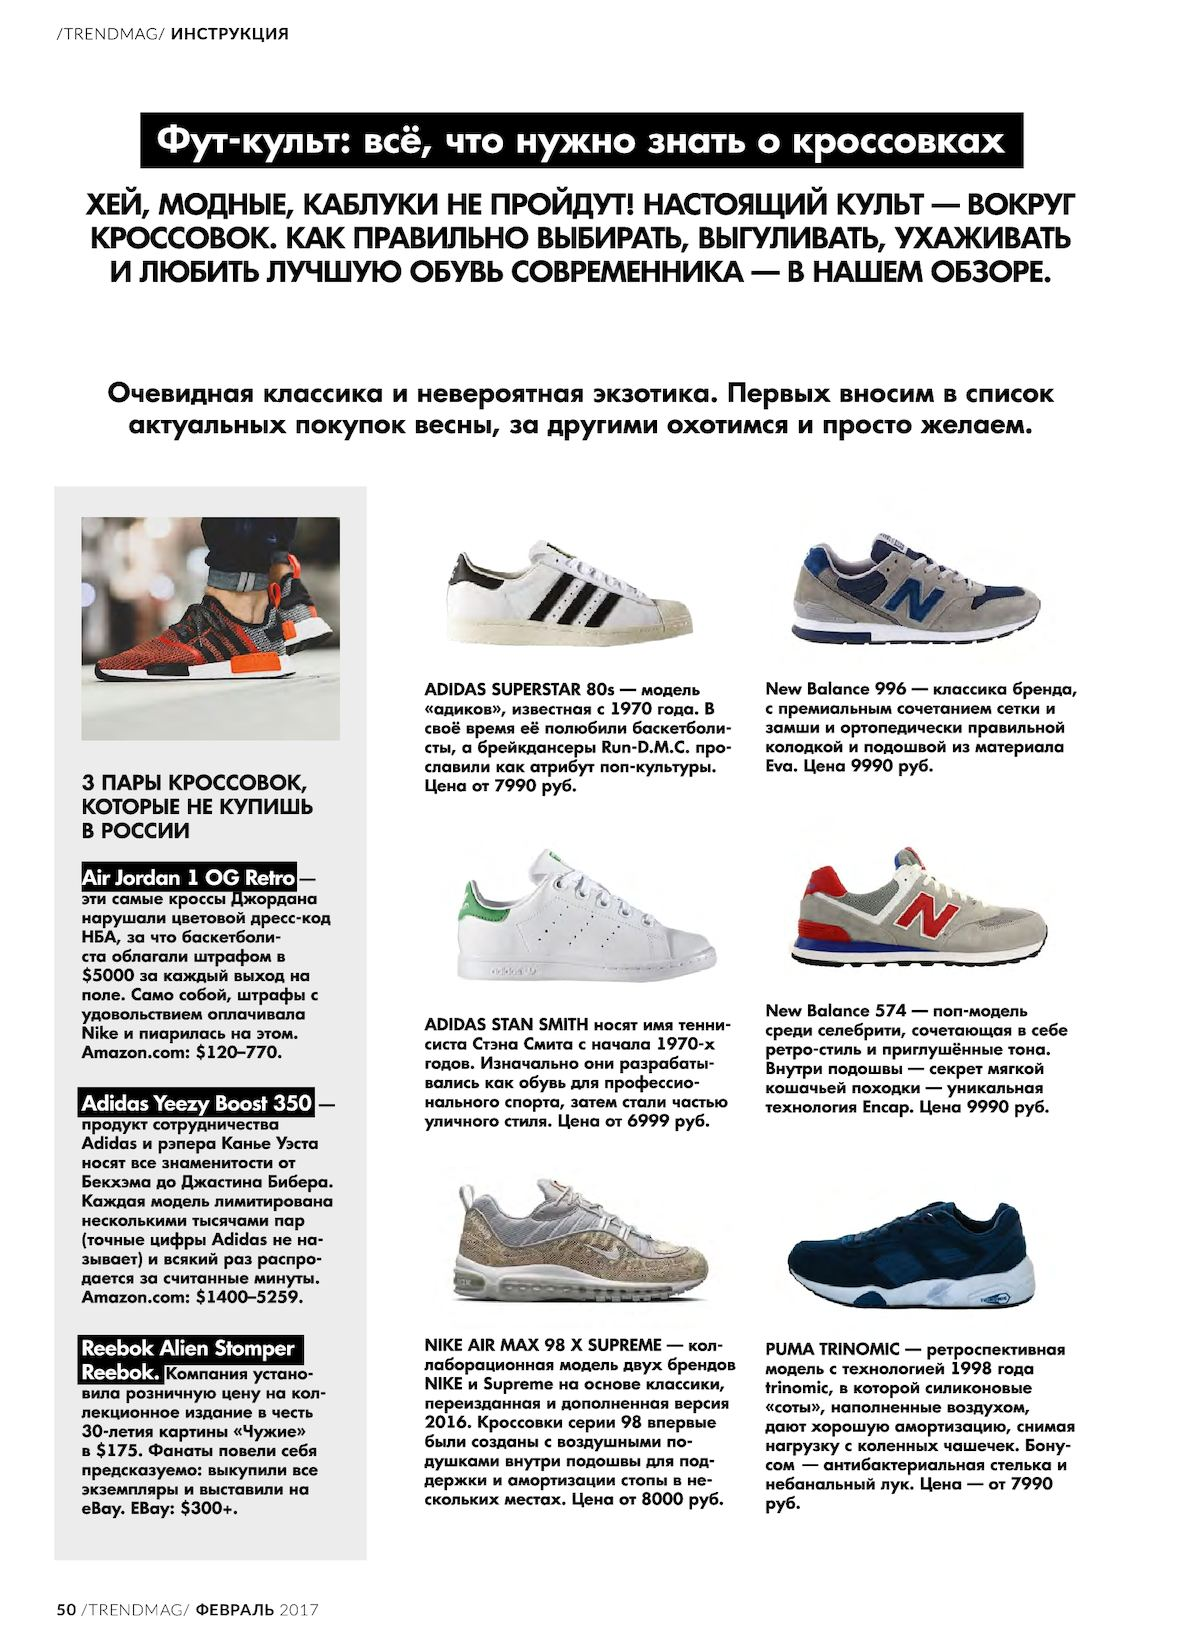 adidas Superstar: The Complete List